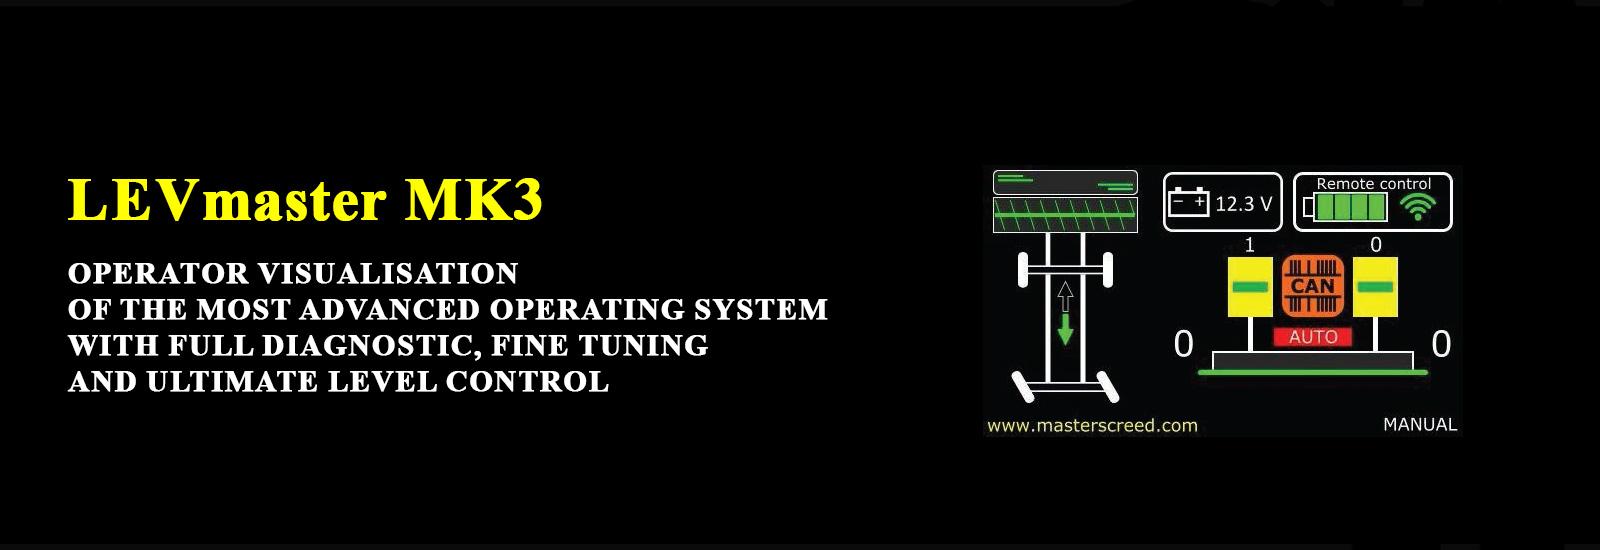 LEVmaster MK3 Operating System